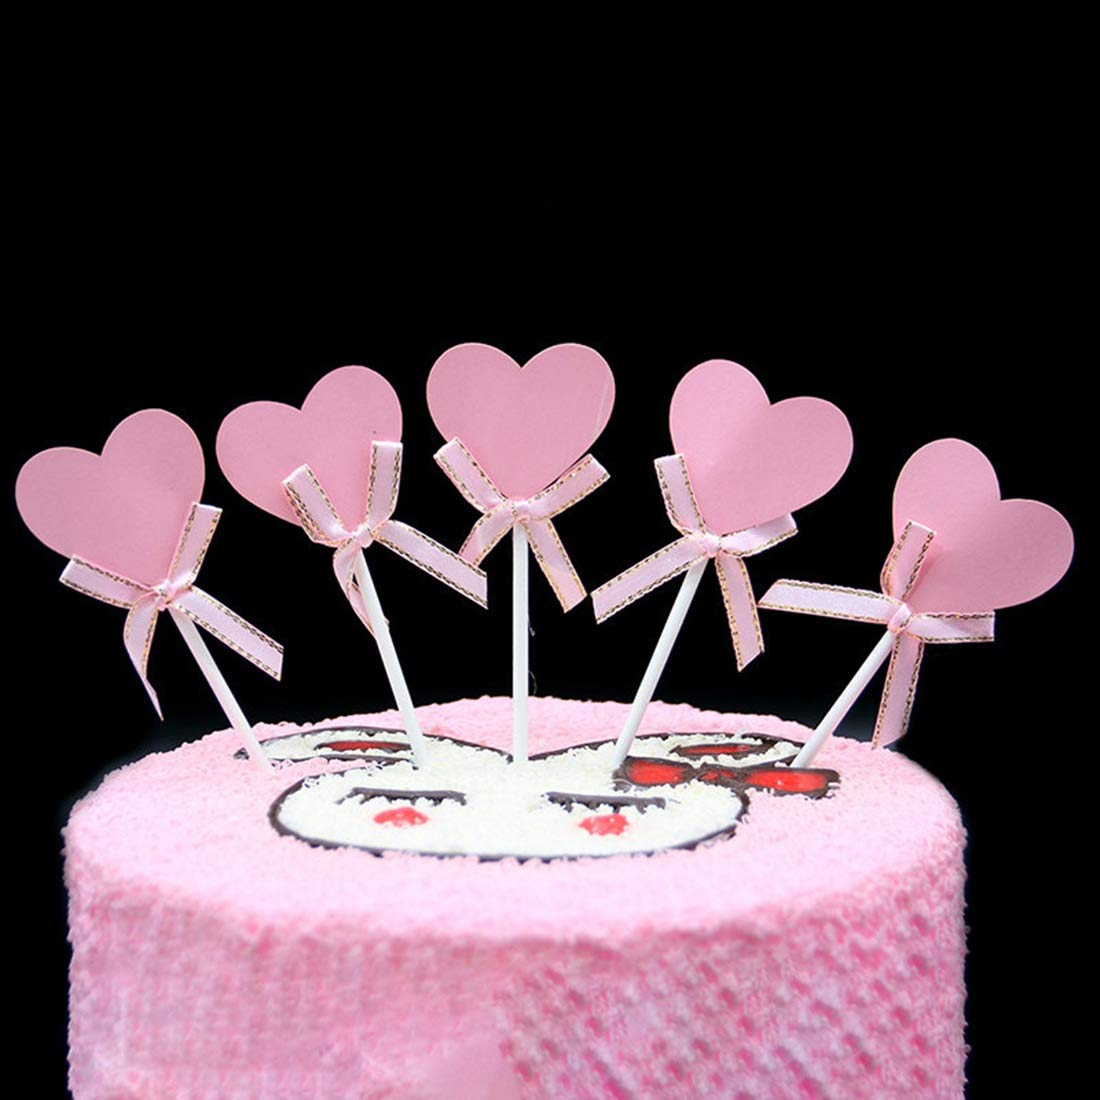 FELICIGG 50 Packs Happy Birthday Cake Topper Dekoration Braut Oder Geburtstag Baby Shower DIY